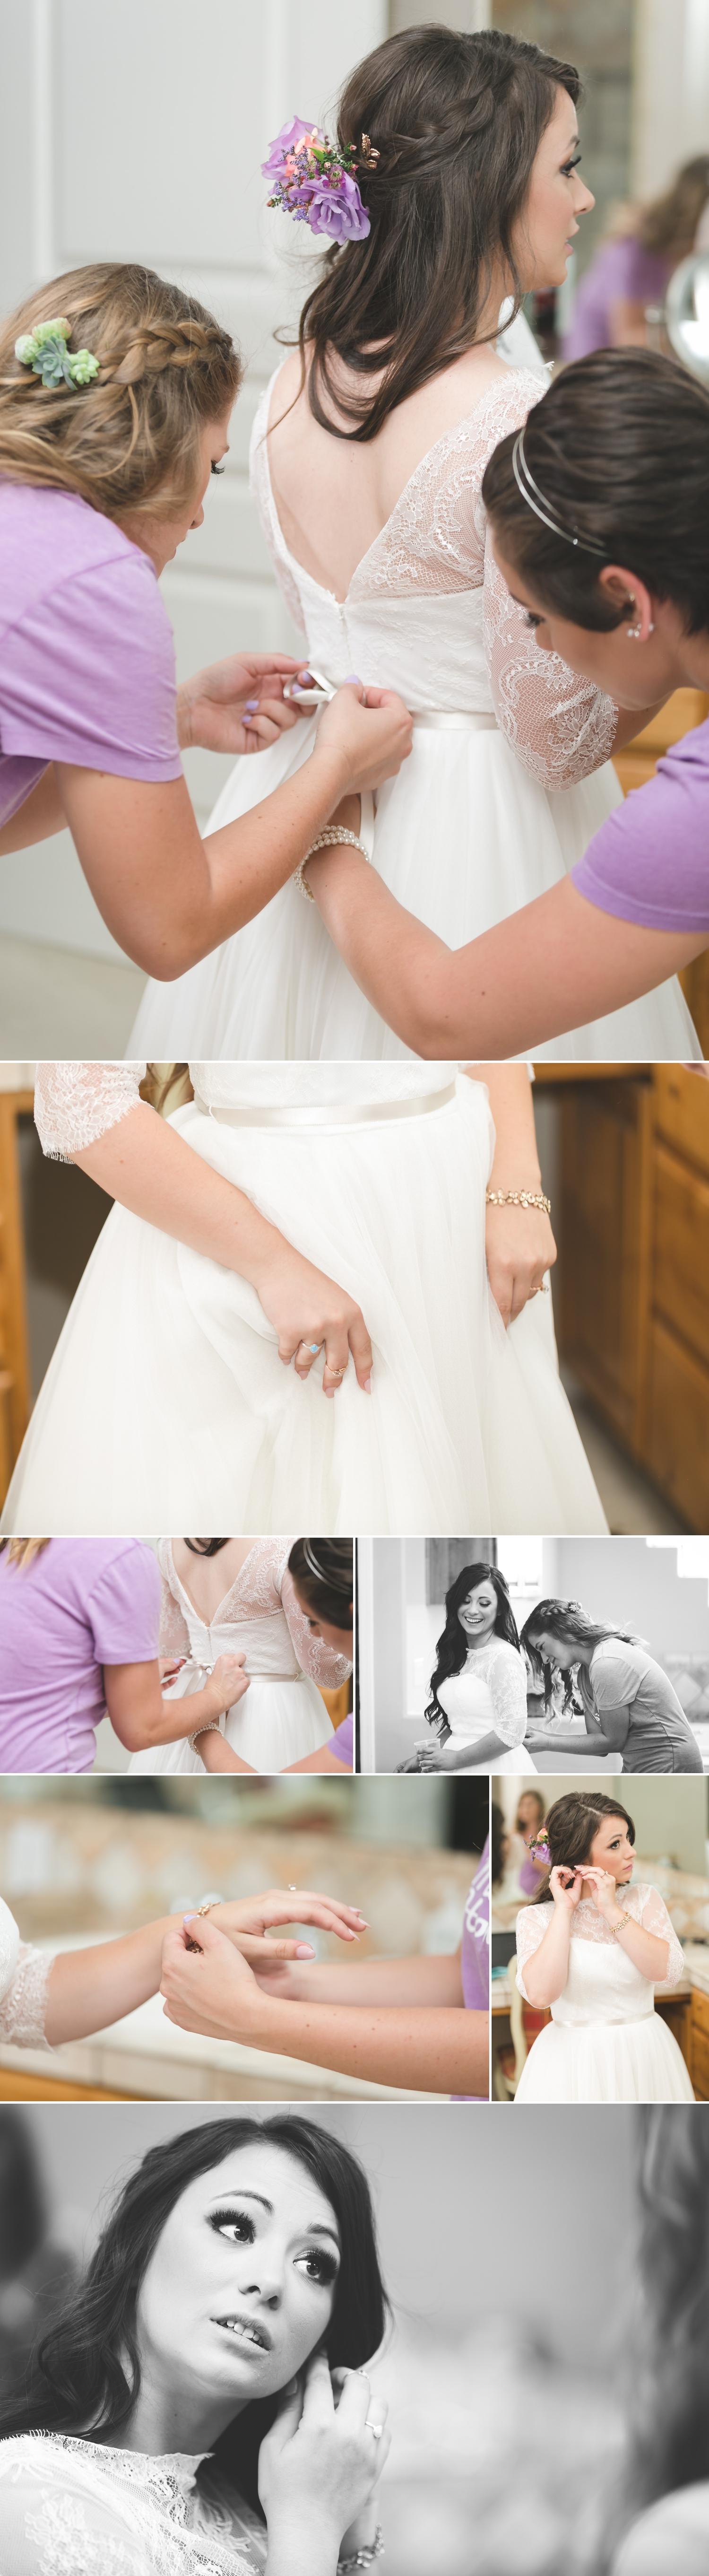 Krassa Wedding blog 1.jpg